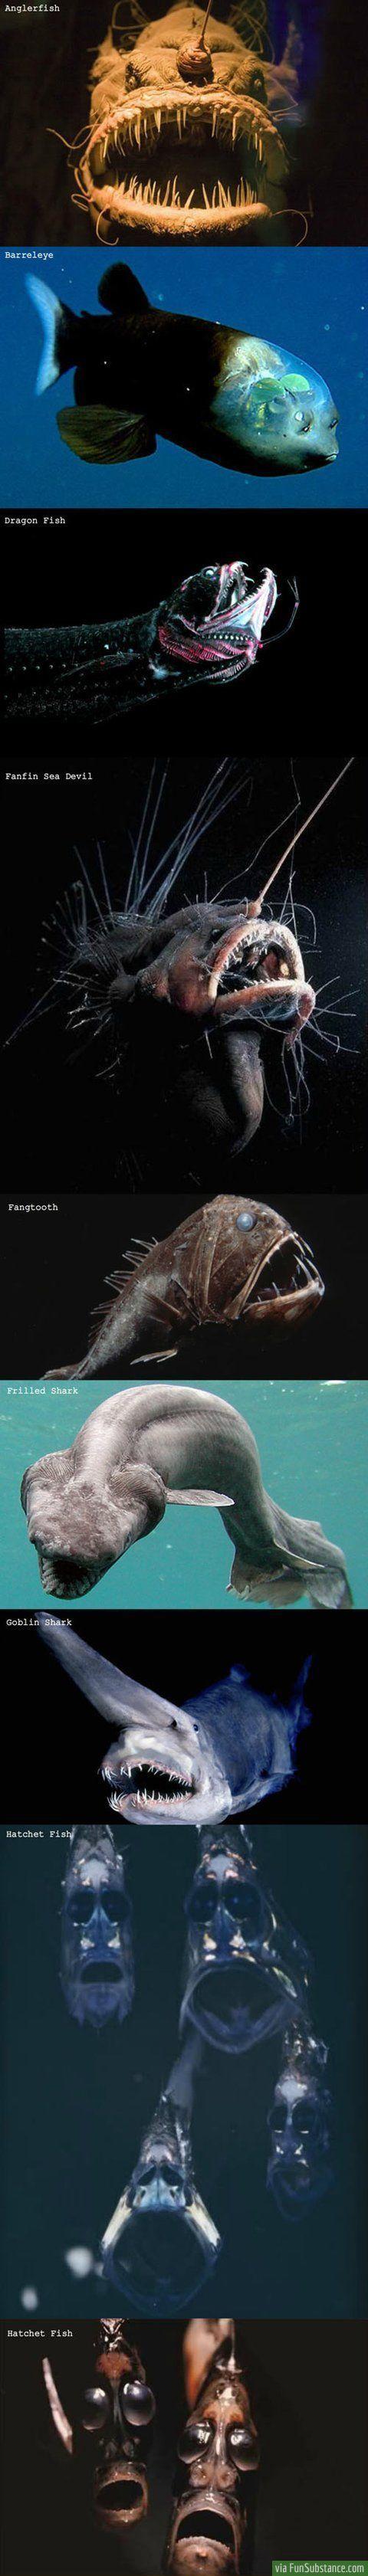 Strange creatures of the sea - FunSubstance.com